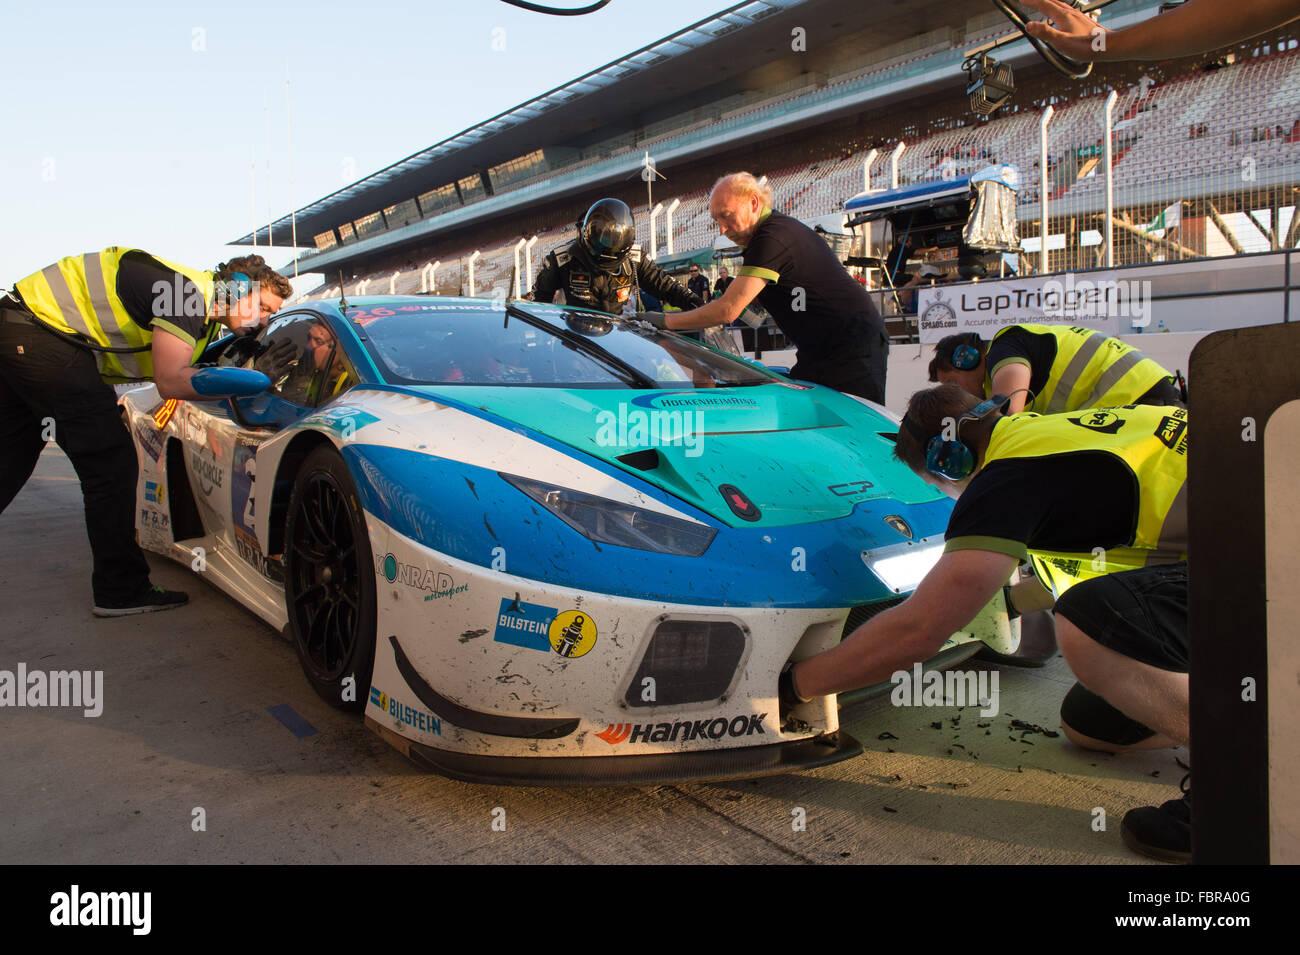 Konrad Motorsport Lamborghini in der Boxengasse im Laufe des Abends die Hankook 24H Dubai Autorennen Stockbild